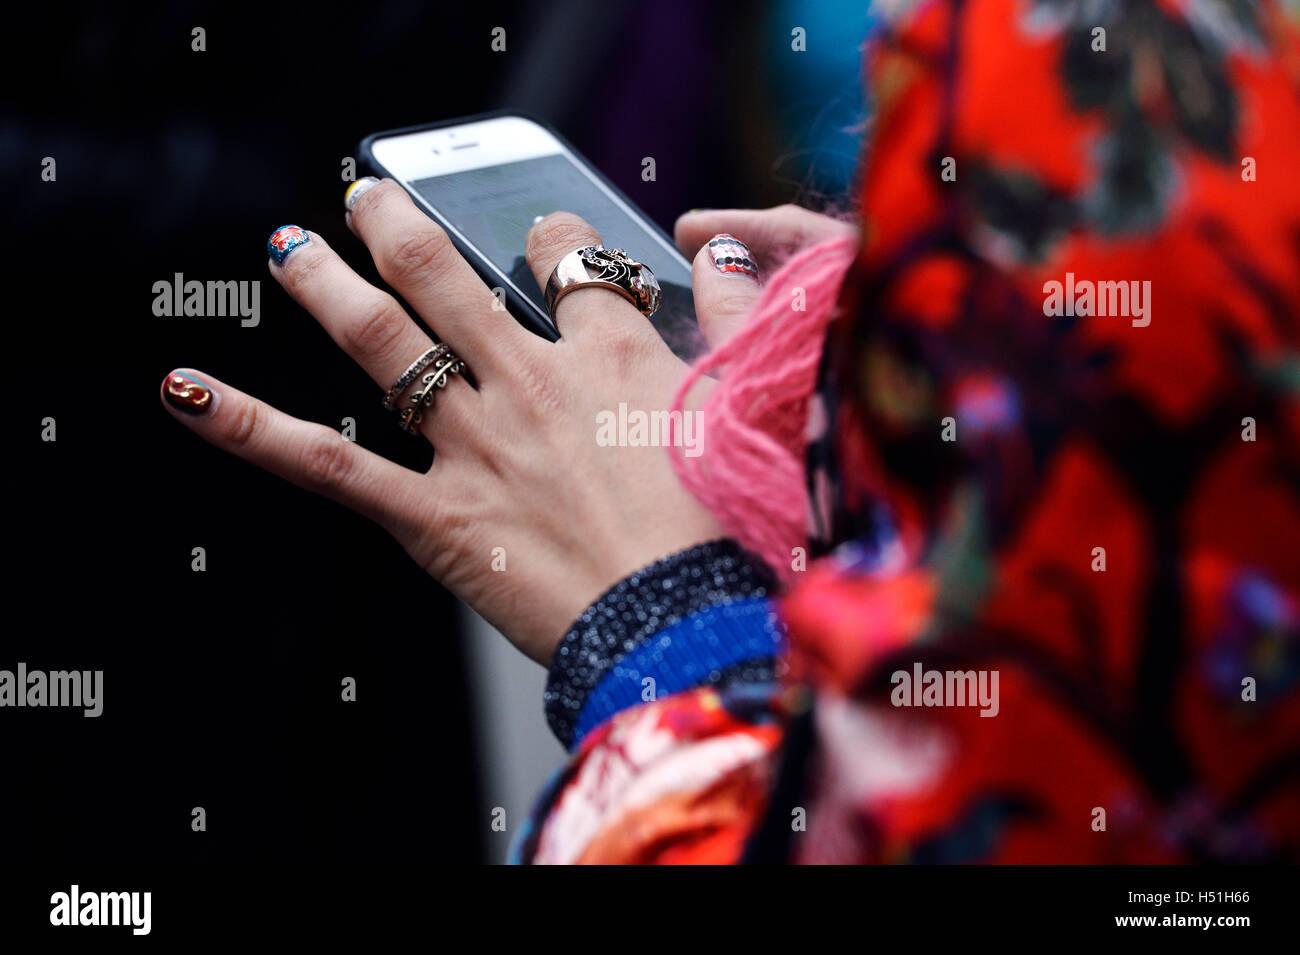 Woman using smartphone at Paris Fashion Week 2016 - Stock Image